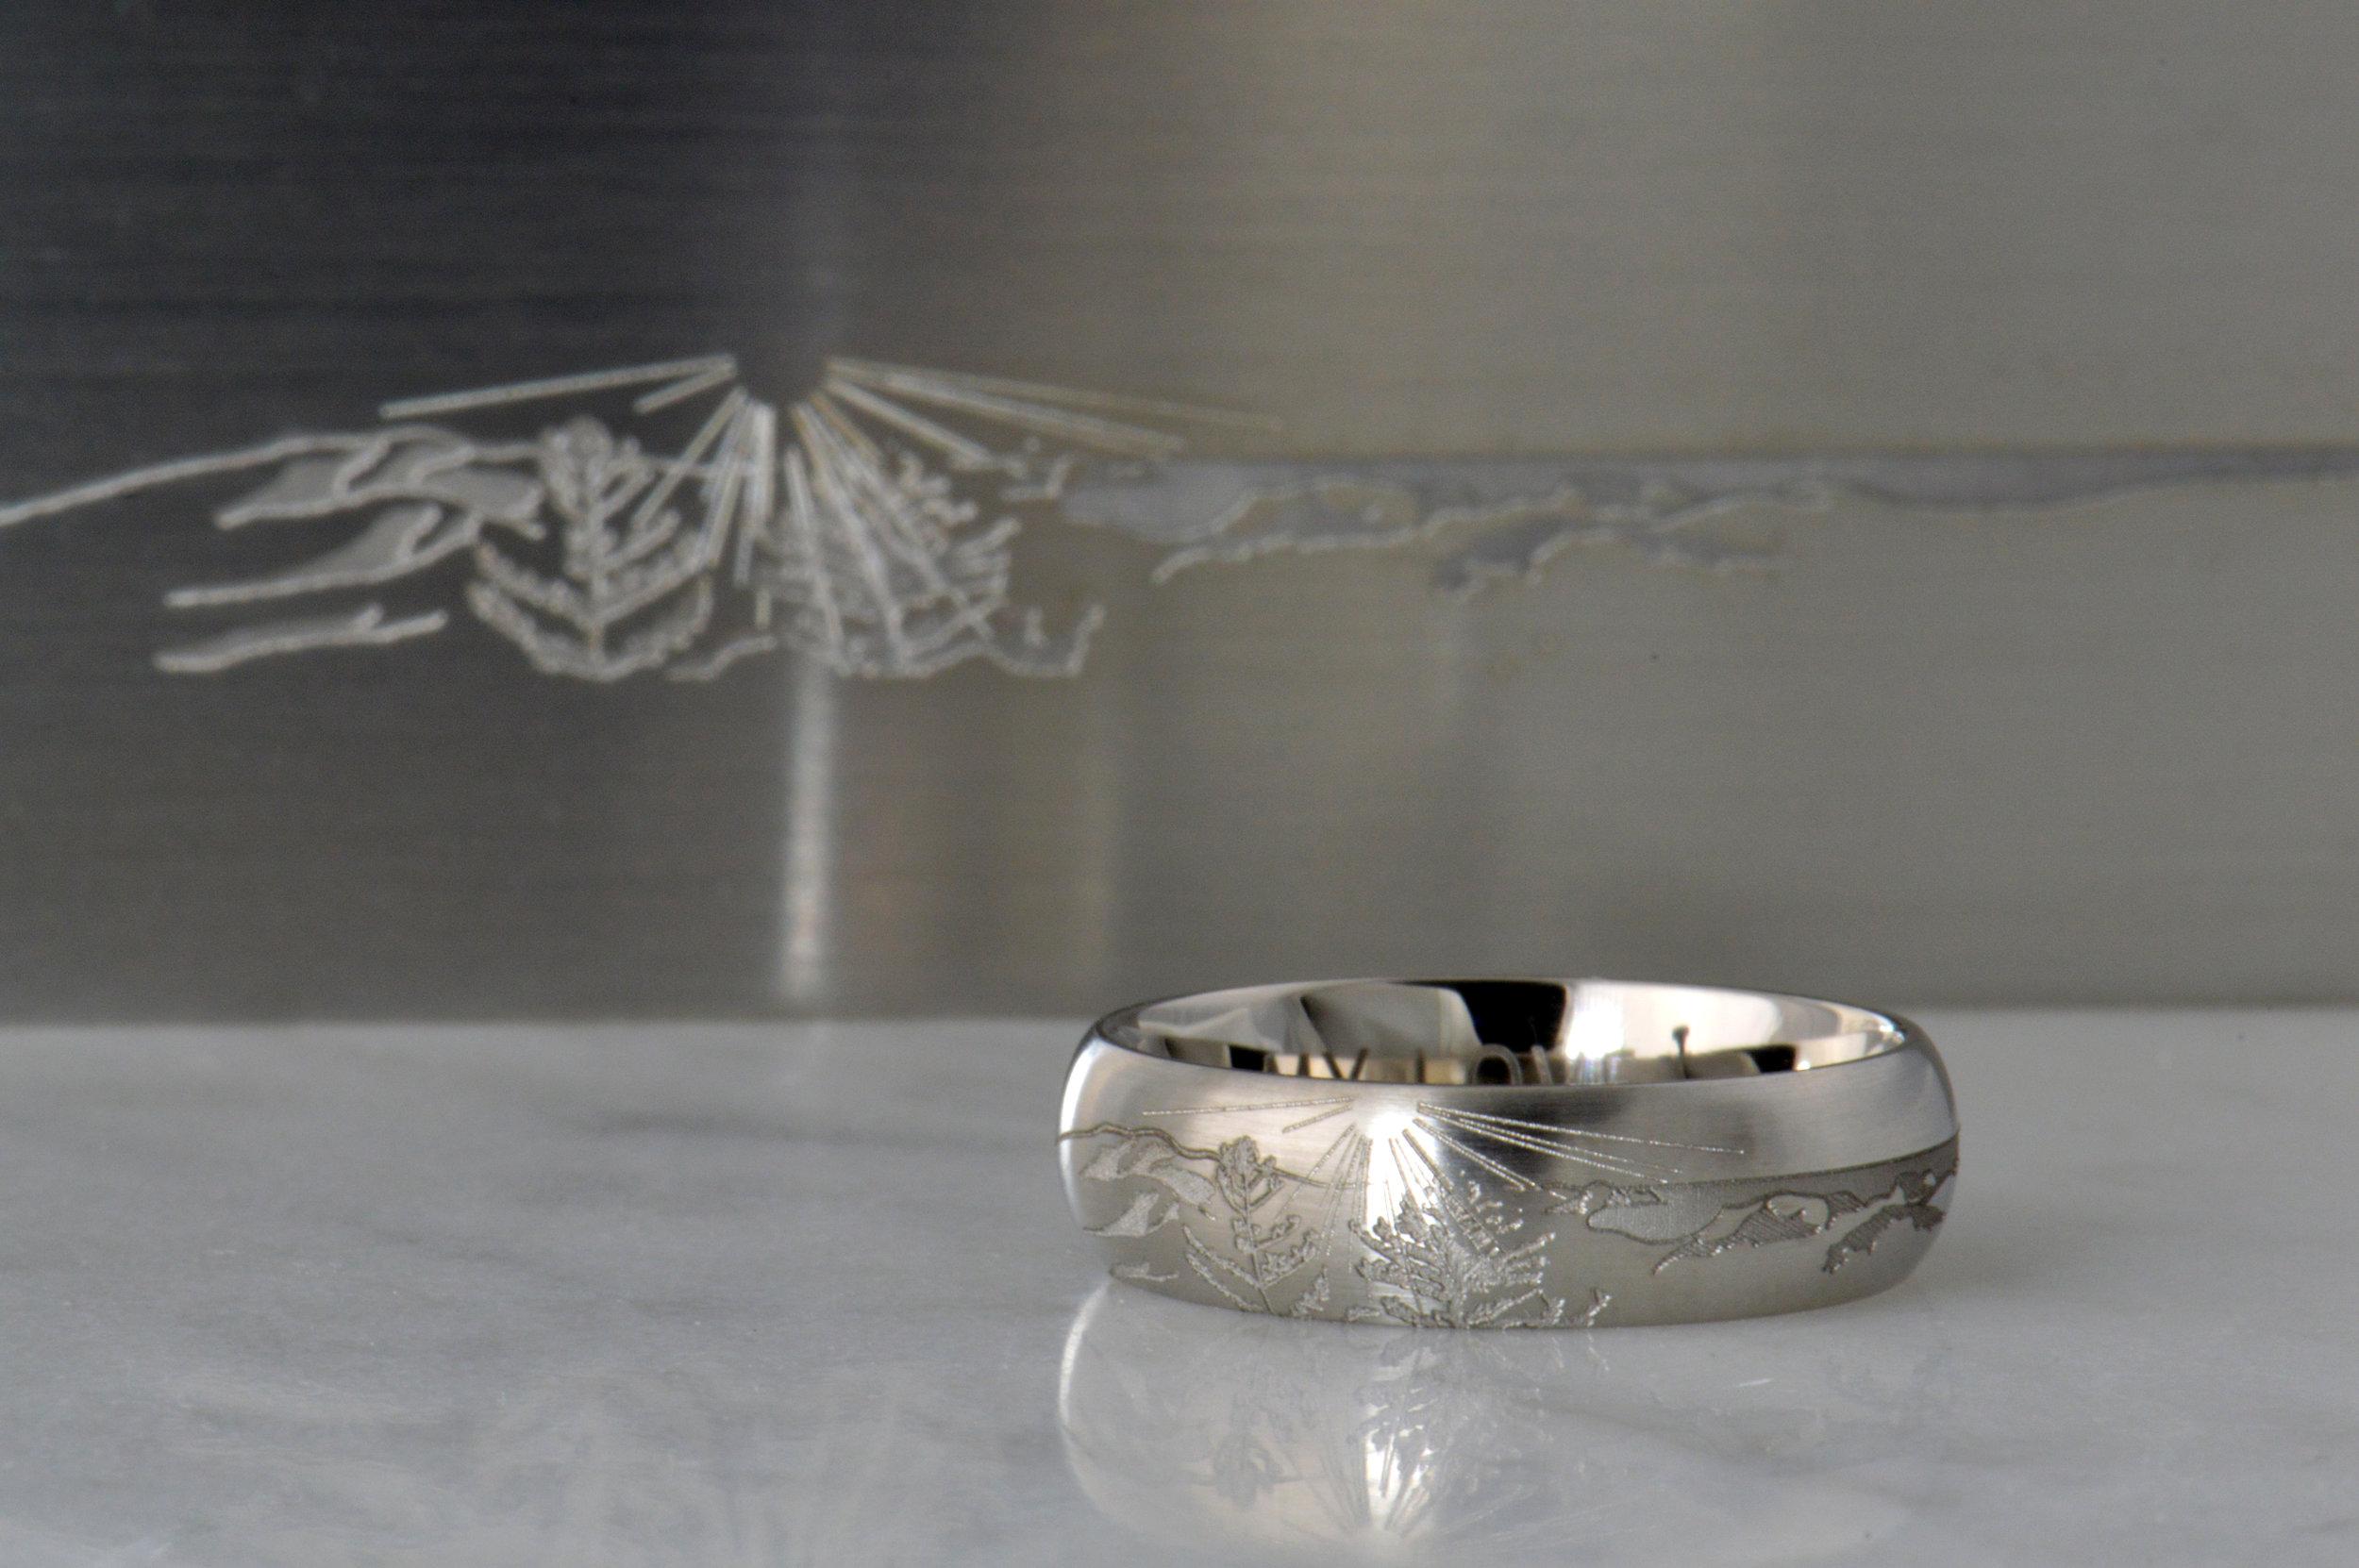 darvier-sunburst-engraved-palladium-wedding-ring.jpg